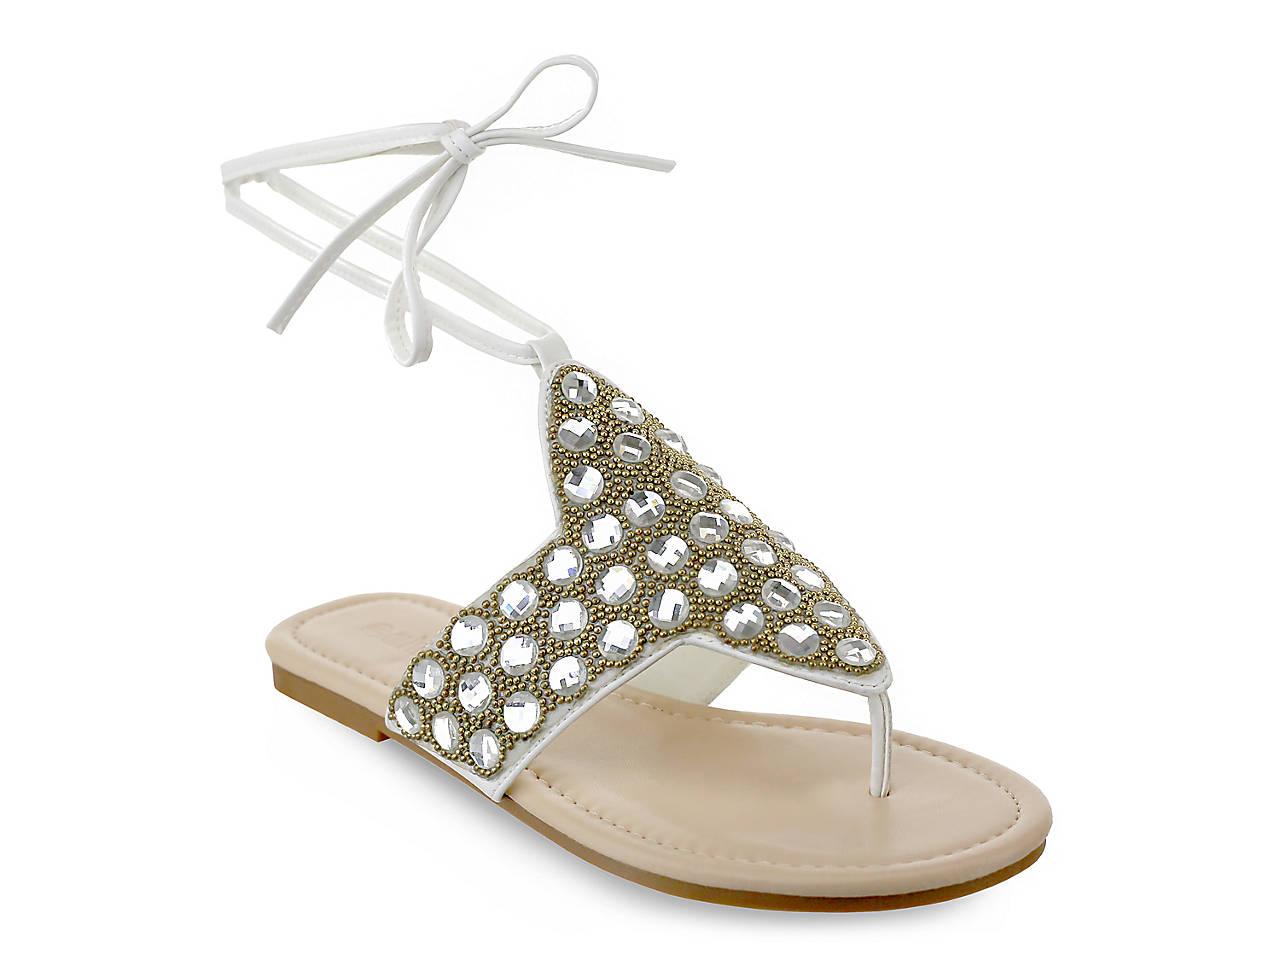 Naples Sandal by Olivia Miller